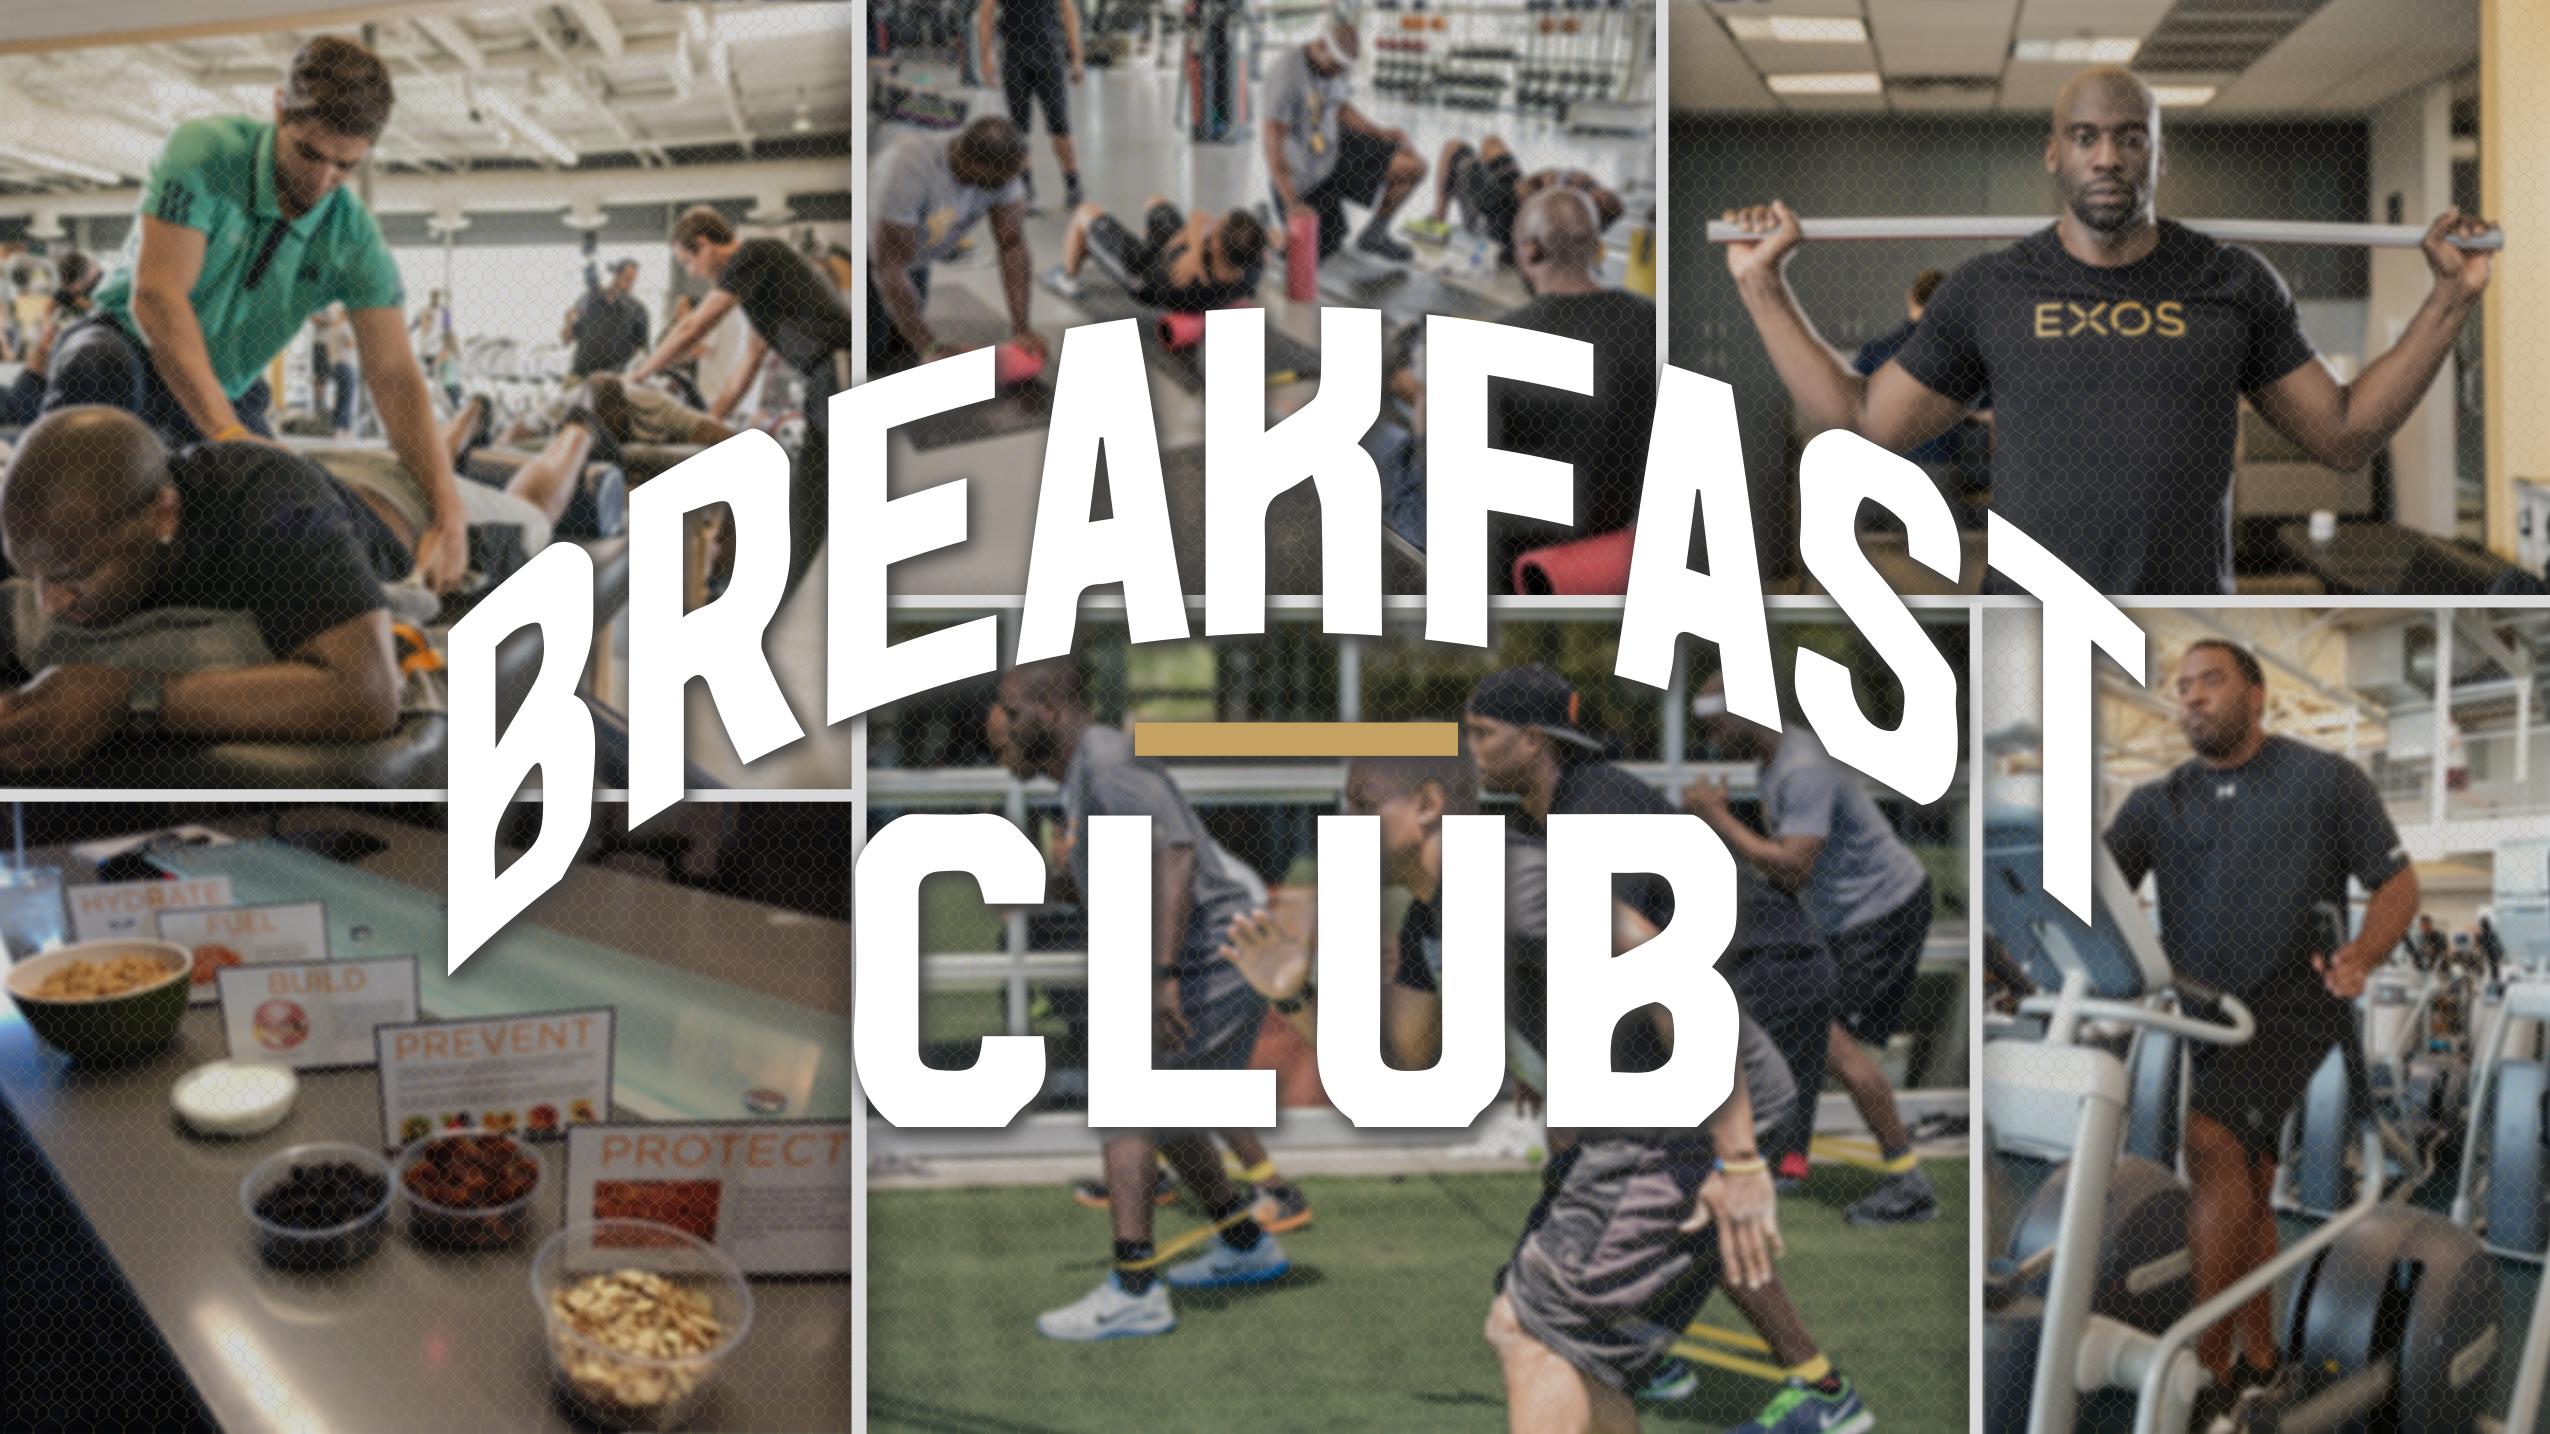 Battle of the breakfast clubs